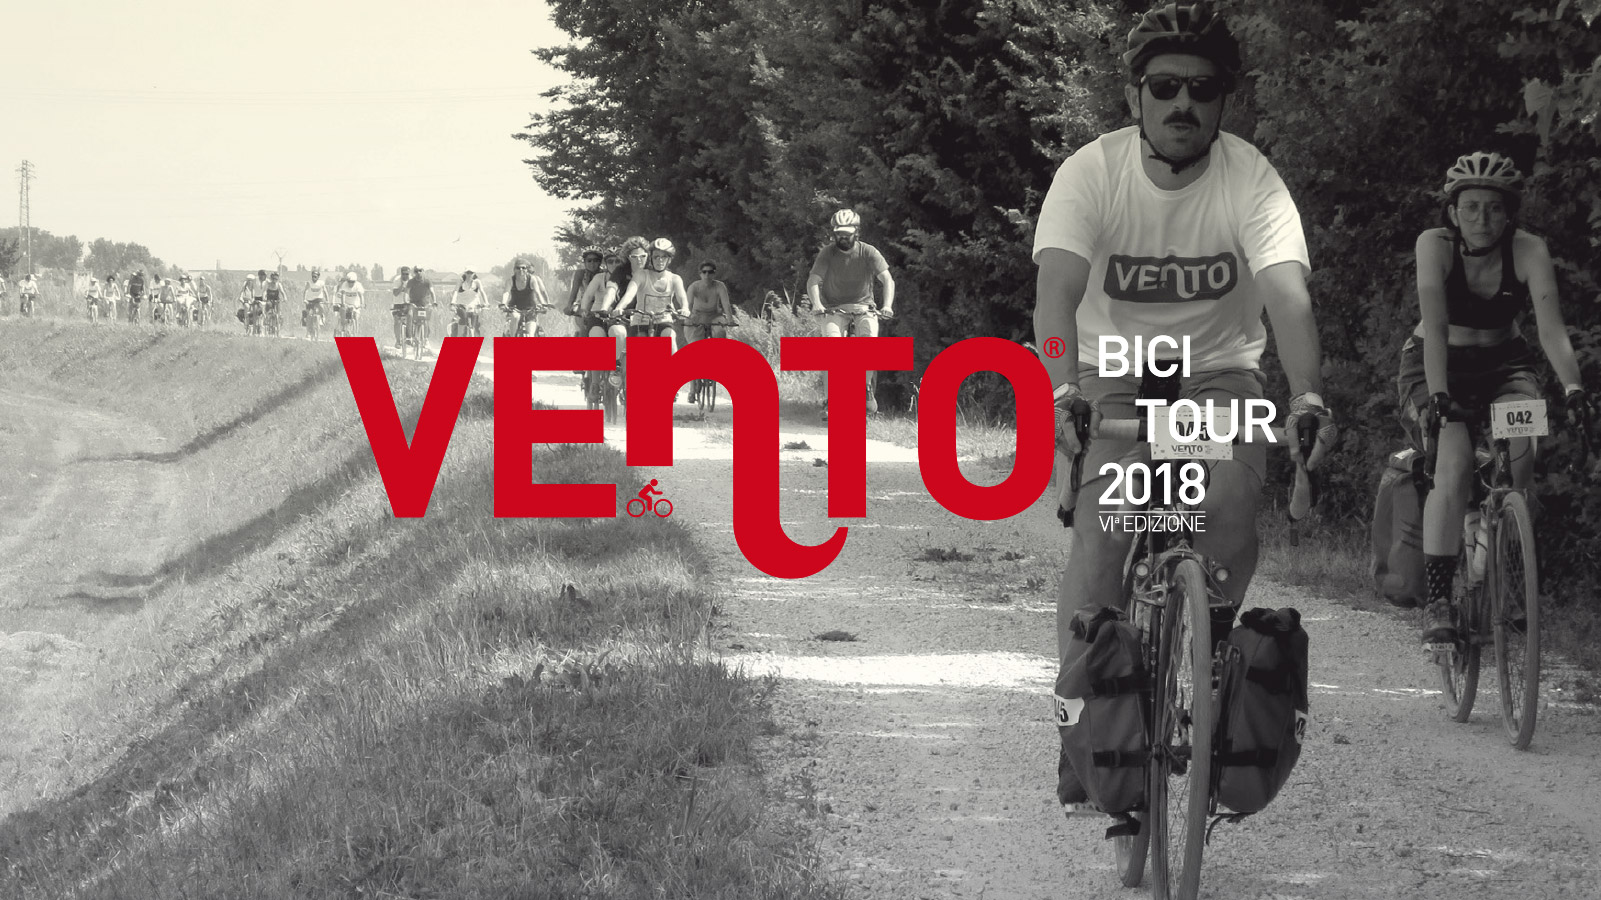 VENTO Bici Tour 2018